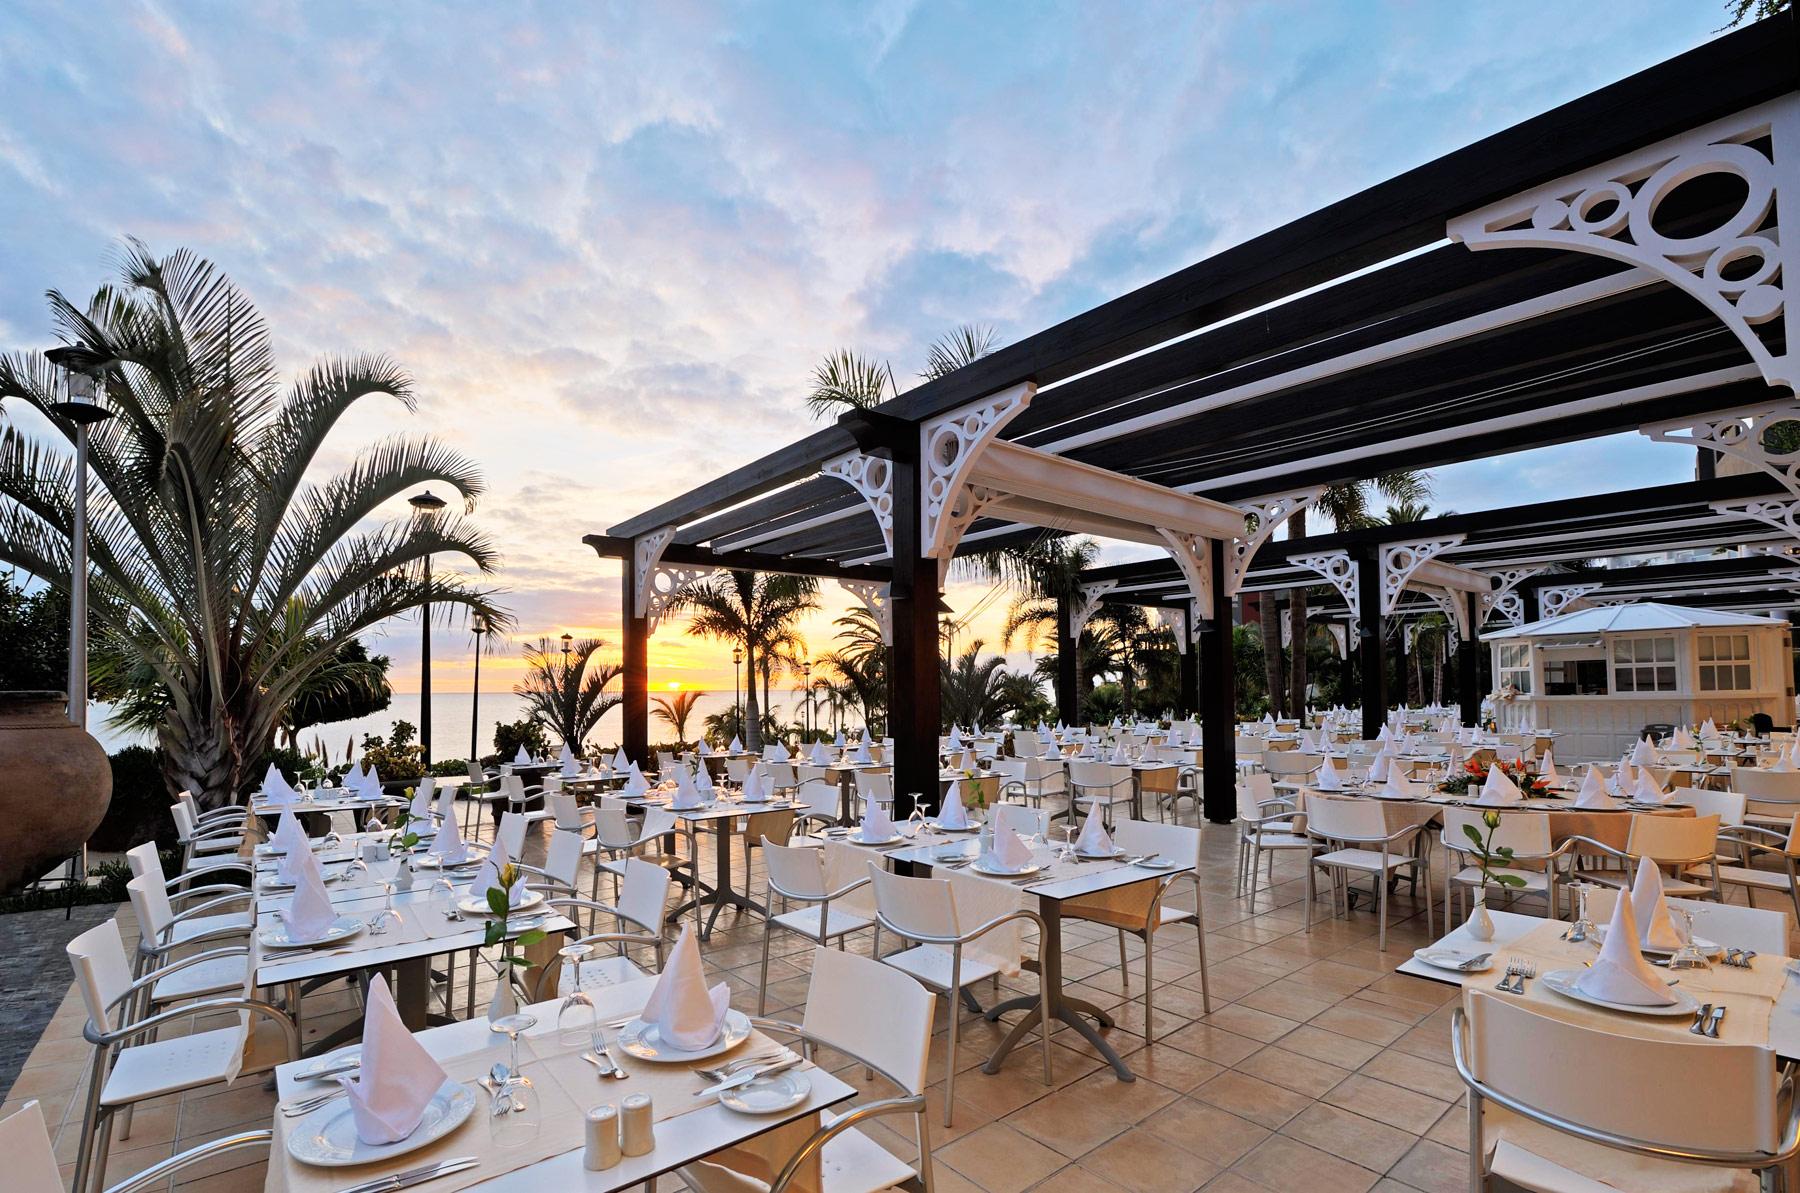 roca-nivaria-restaurant